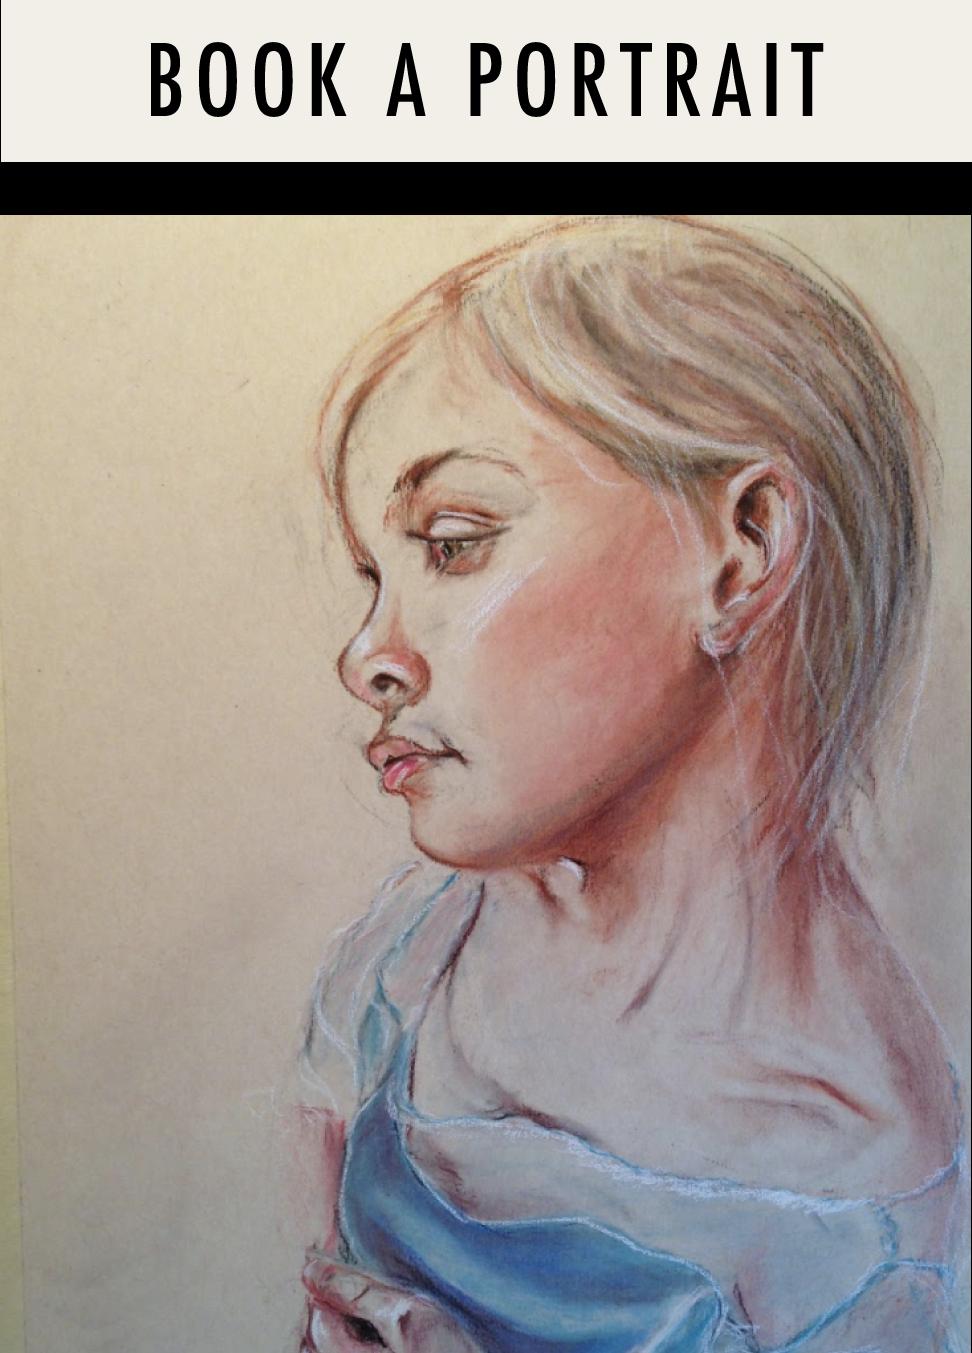 Book-a-Portrait-With-Artist-Chuck-Schroeder.png